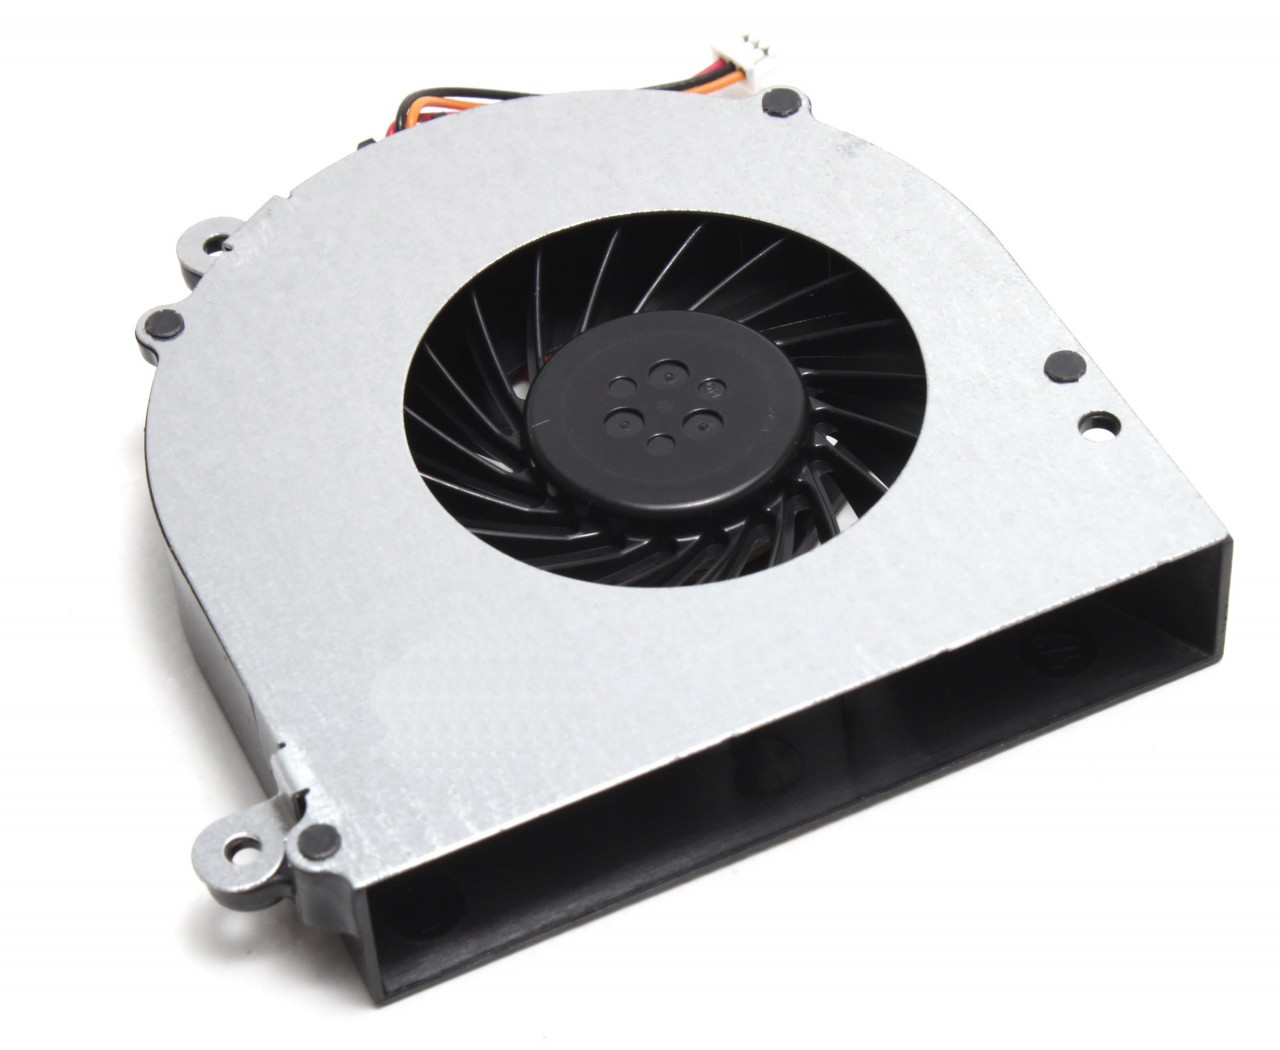 Cooler laptop Toshiba Satellite A505D compatibil doar pentru varianta echipata cu procesor Intel i-Core imagine powerlaptop.ro 2021